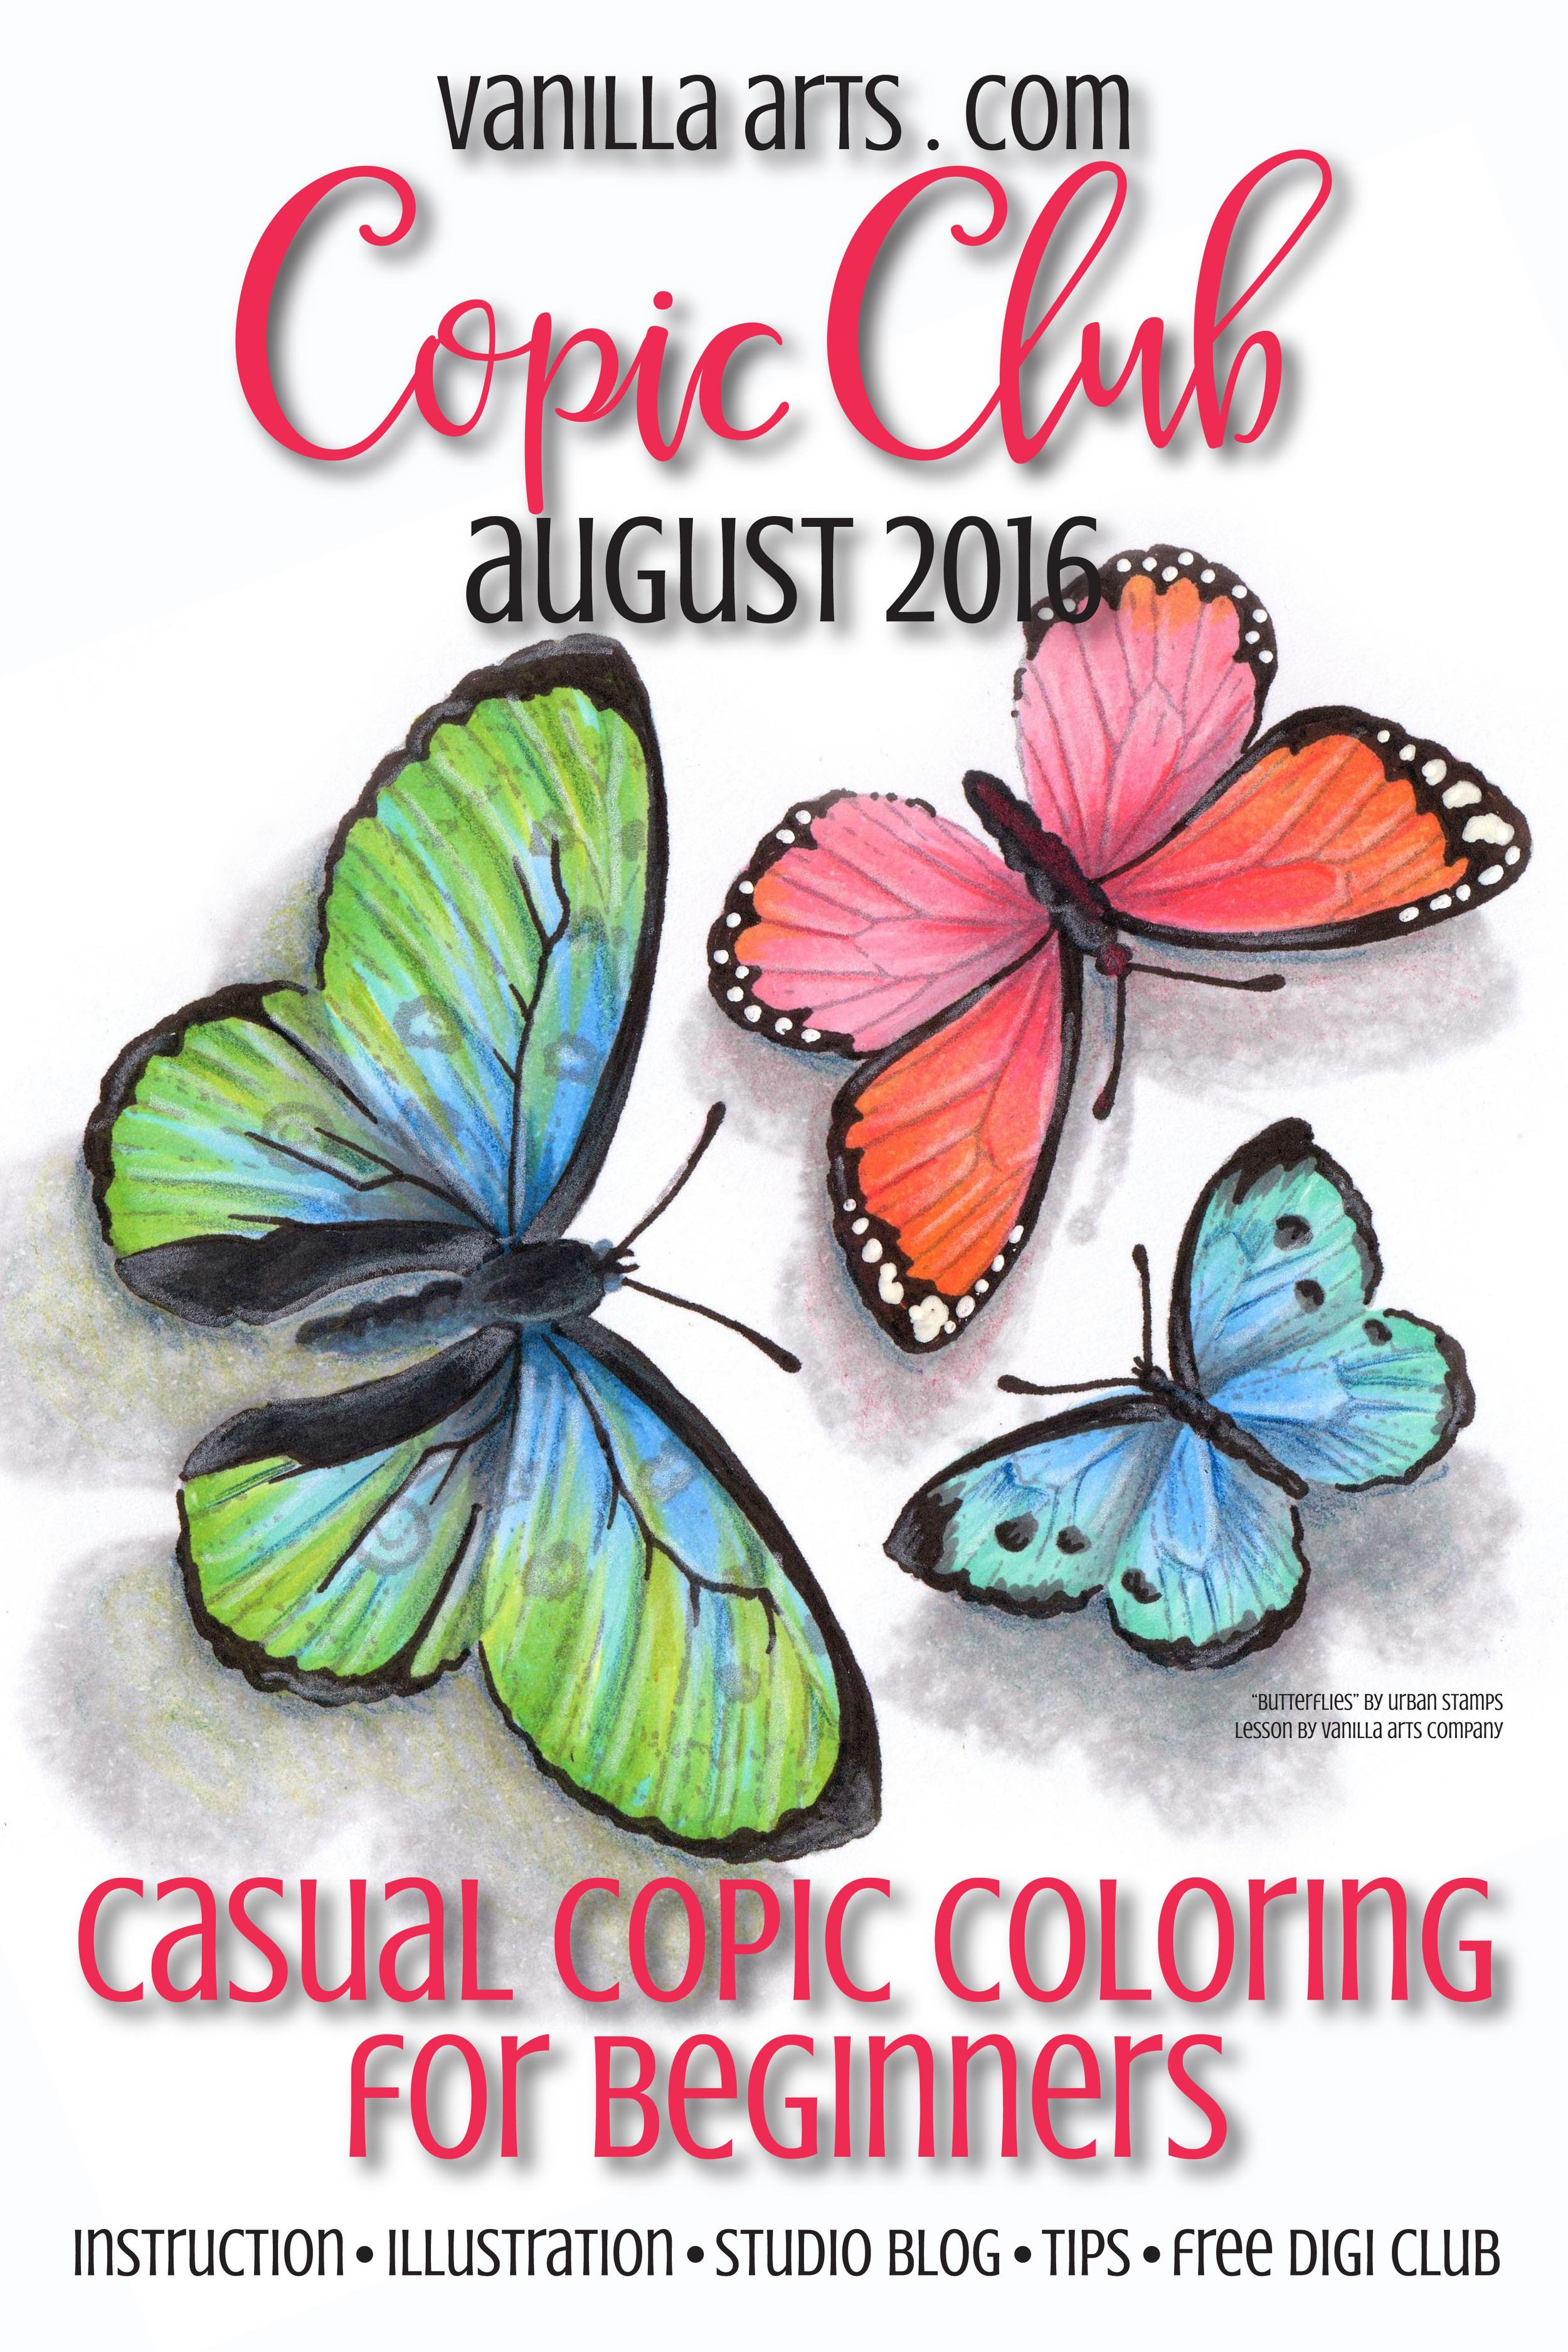 Beginner level casual Copic coloring lessons   VanillaArts.com